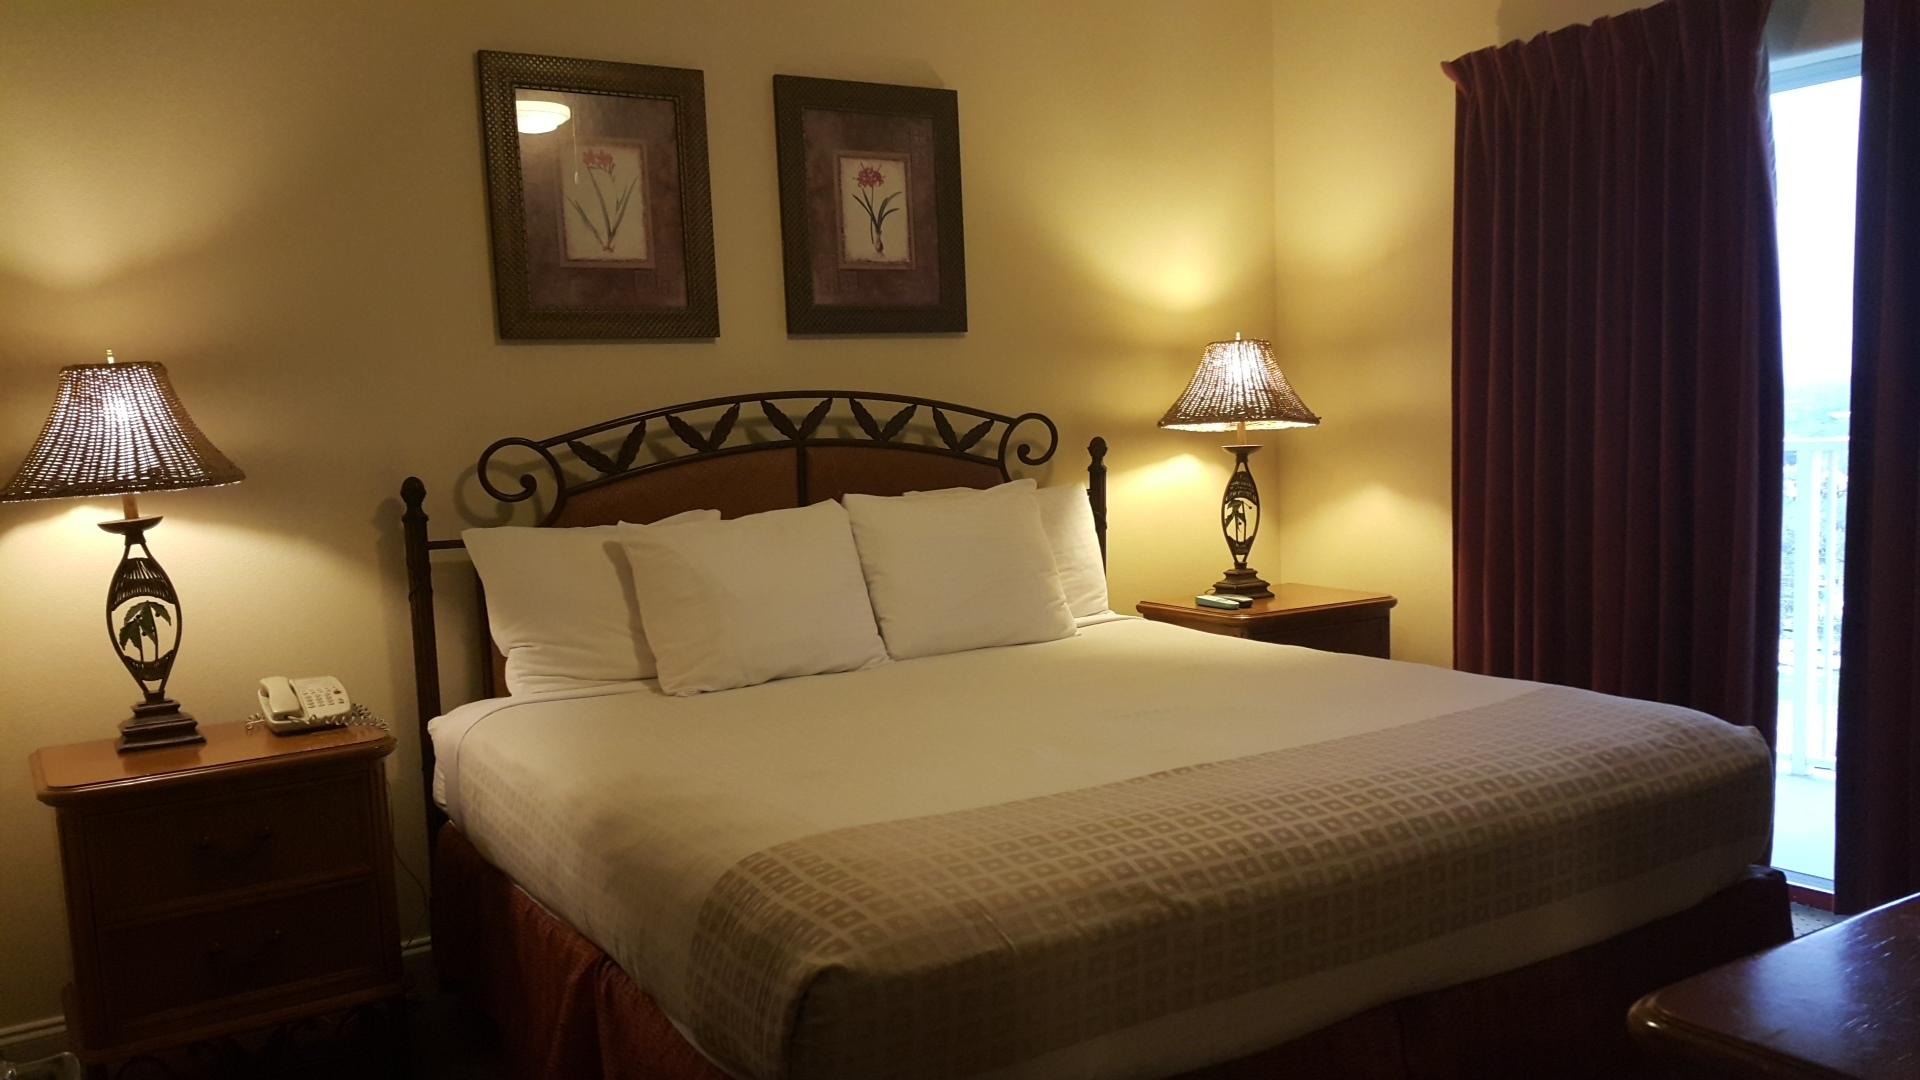 Blue Heron Beach Resort 1-809/1-1509